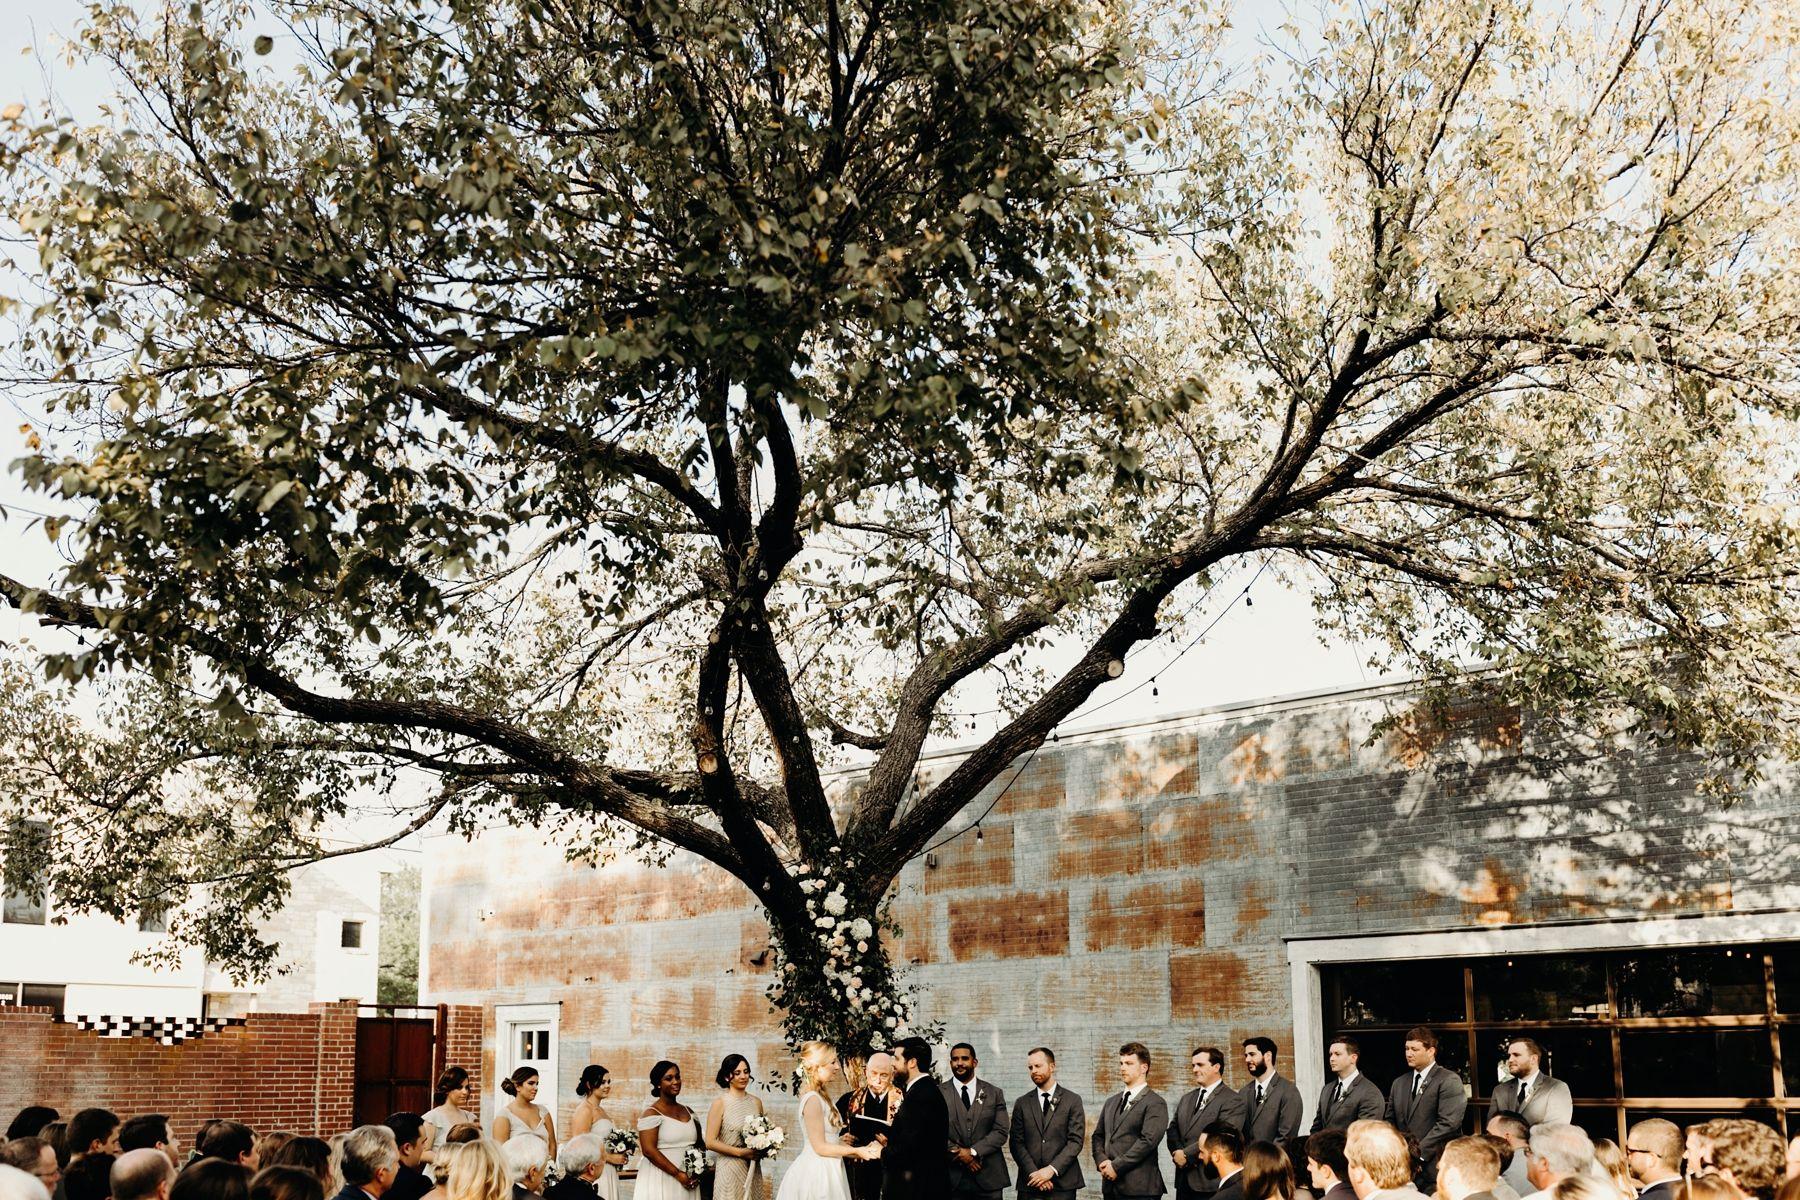 Union On Eighth Wedding Lauren And Patrick Gloria Goode Photography Historic Wedding Venue Industrial Wedding Venues Industrial Wedding